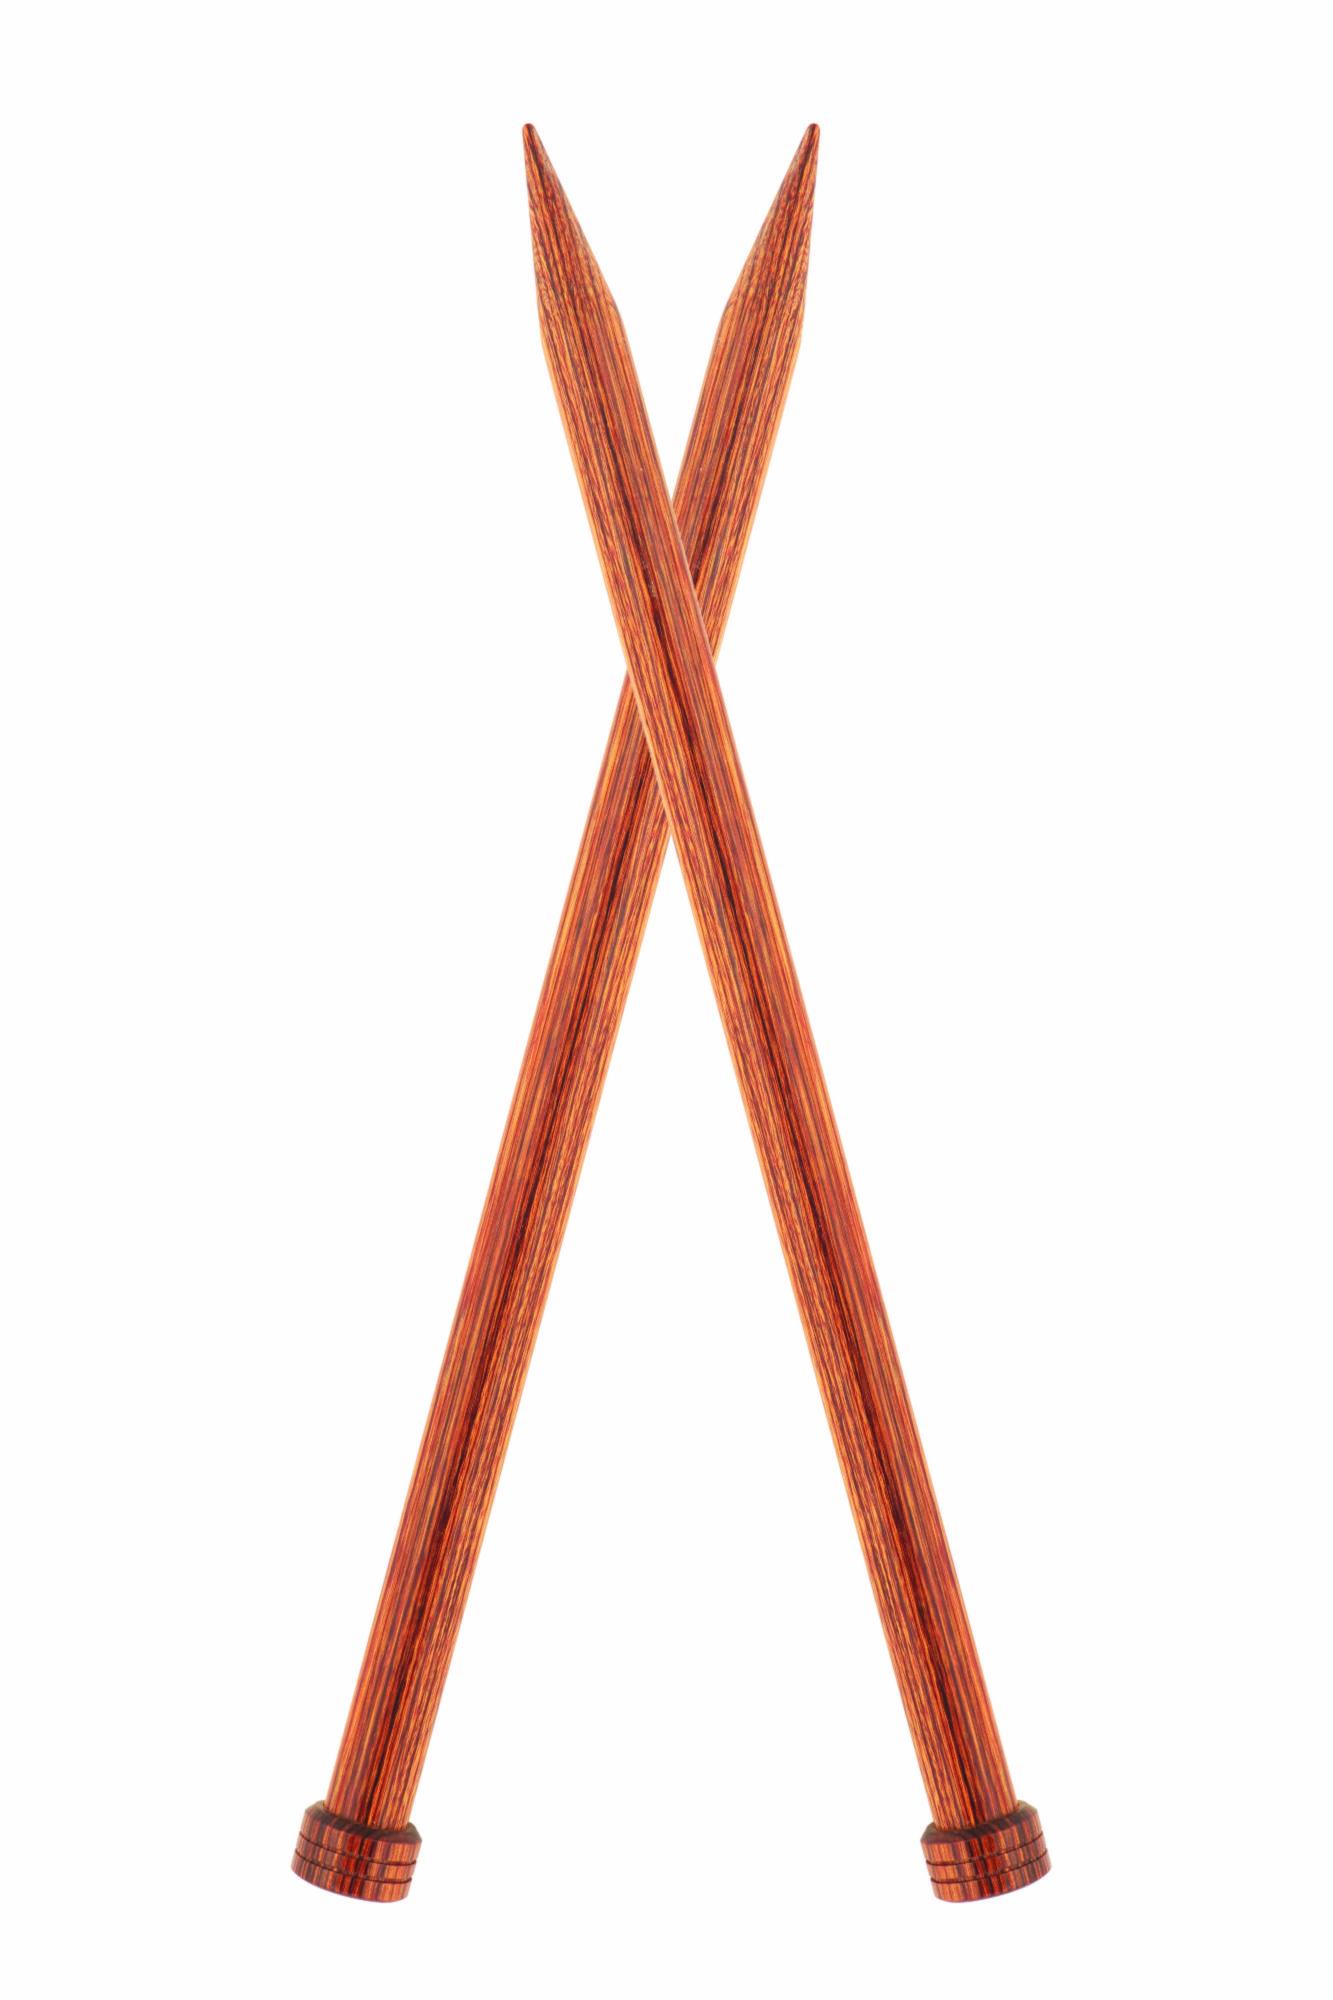 31152 Спицы прямые 8.00 мм - 25 см Ginger KnitPro